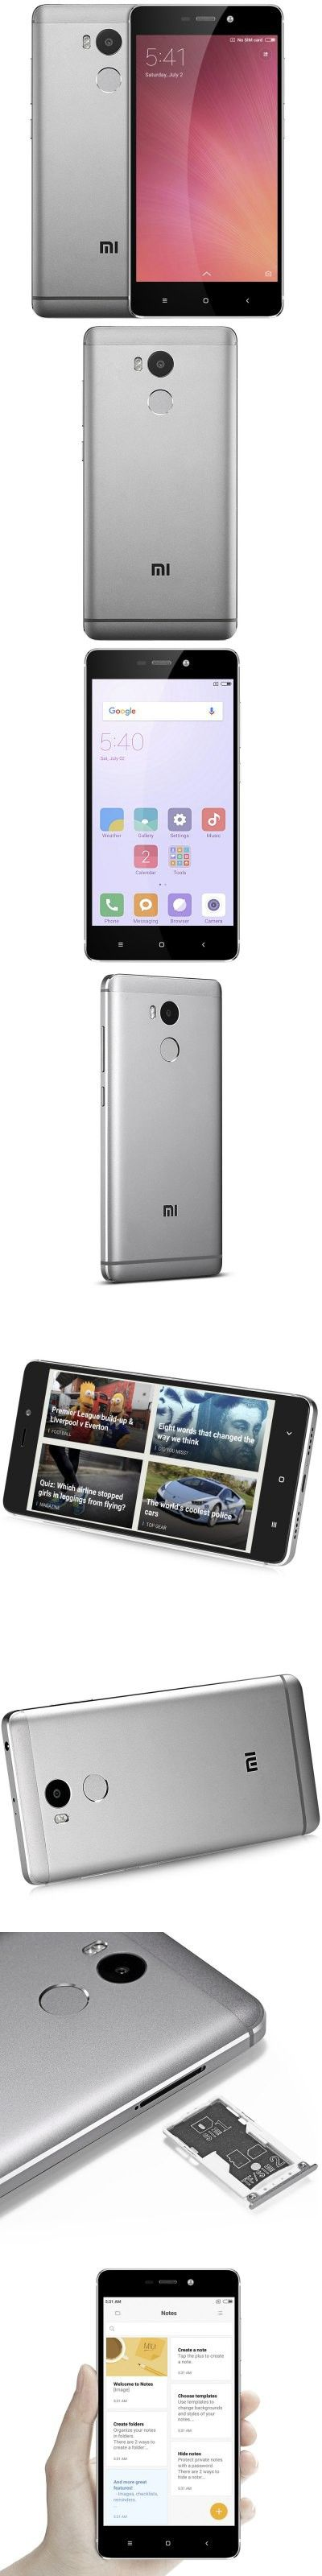 Xiaomi Redmi 4 4G Smartphone HK WAREHOUSE-$171.68